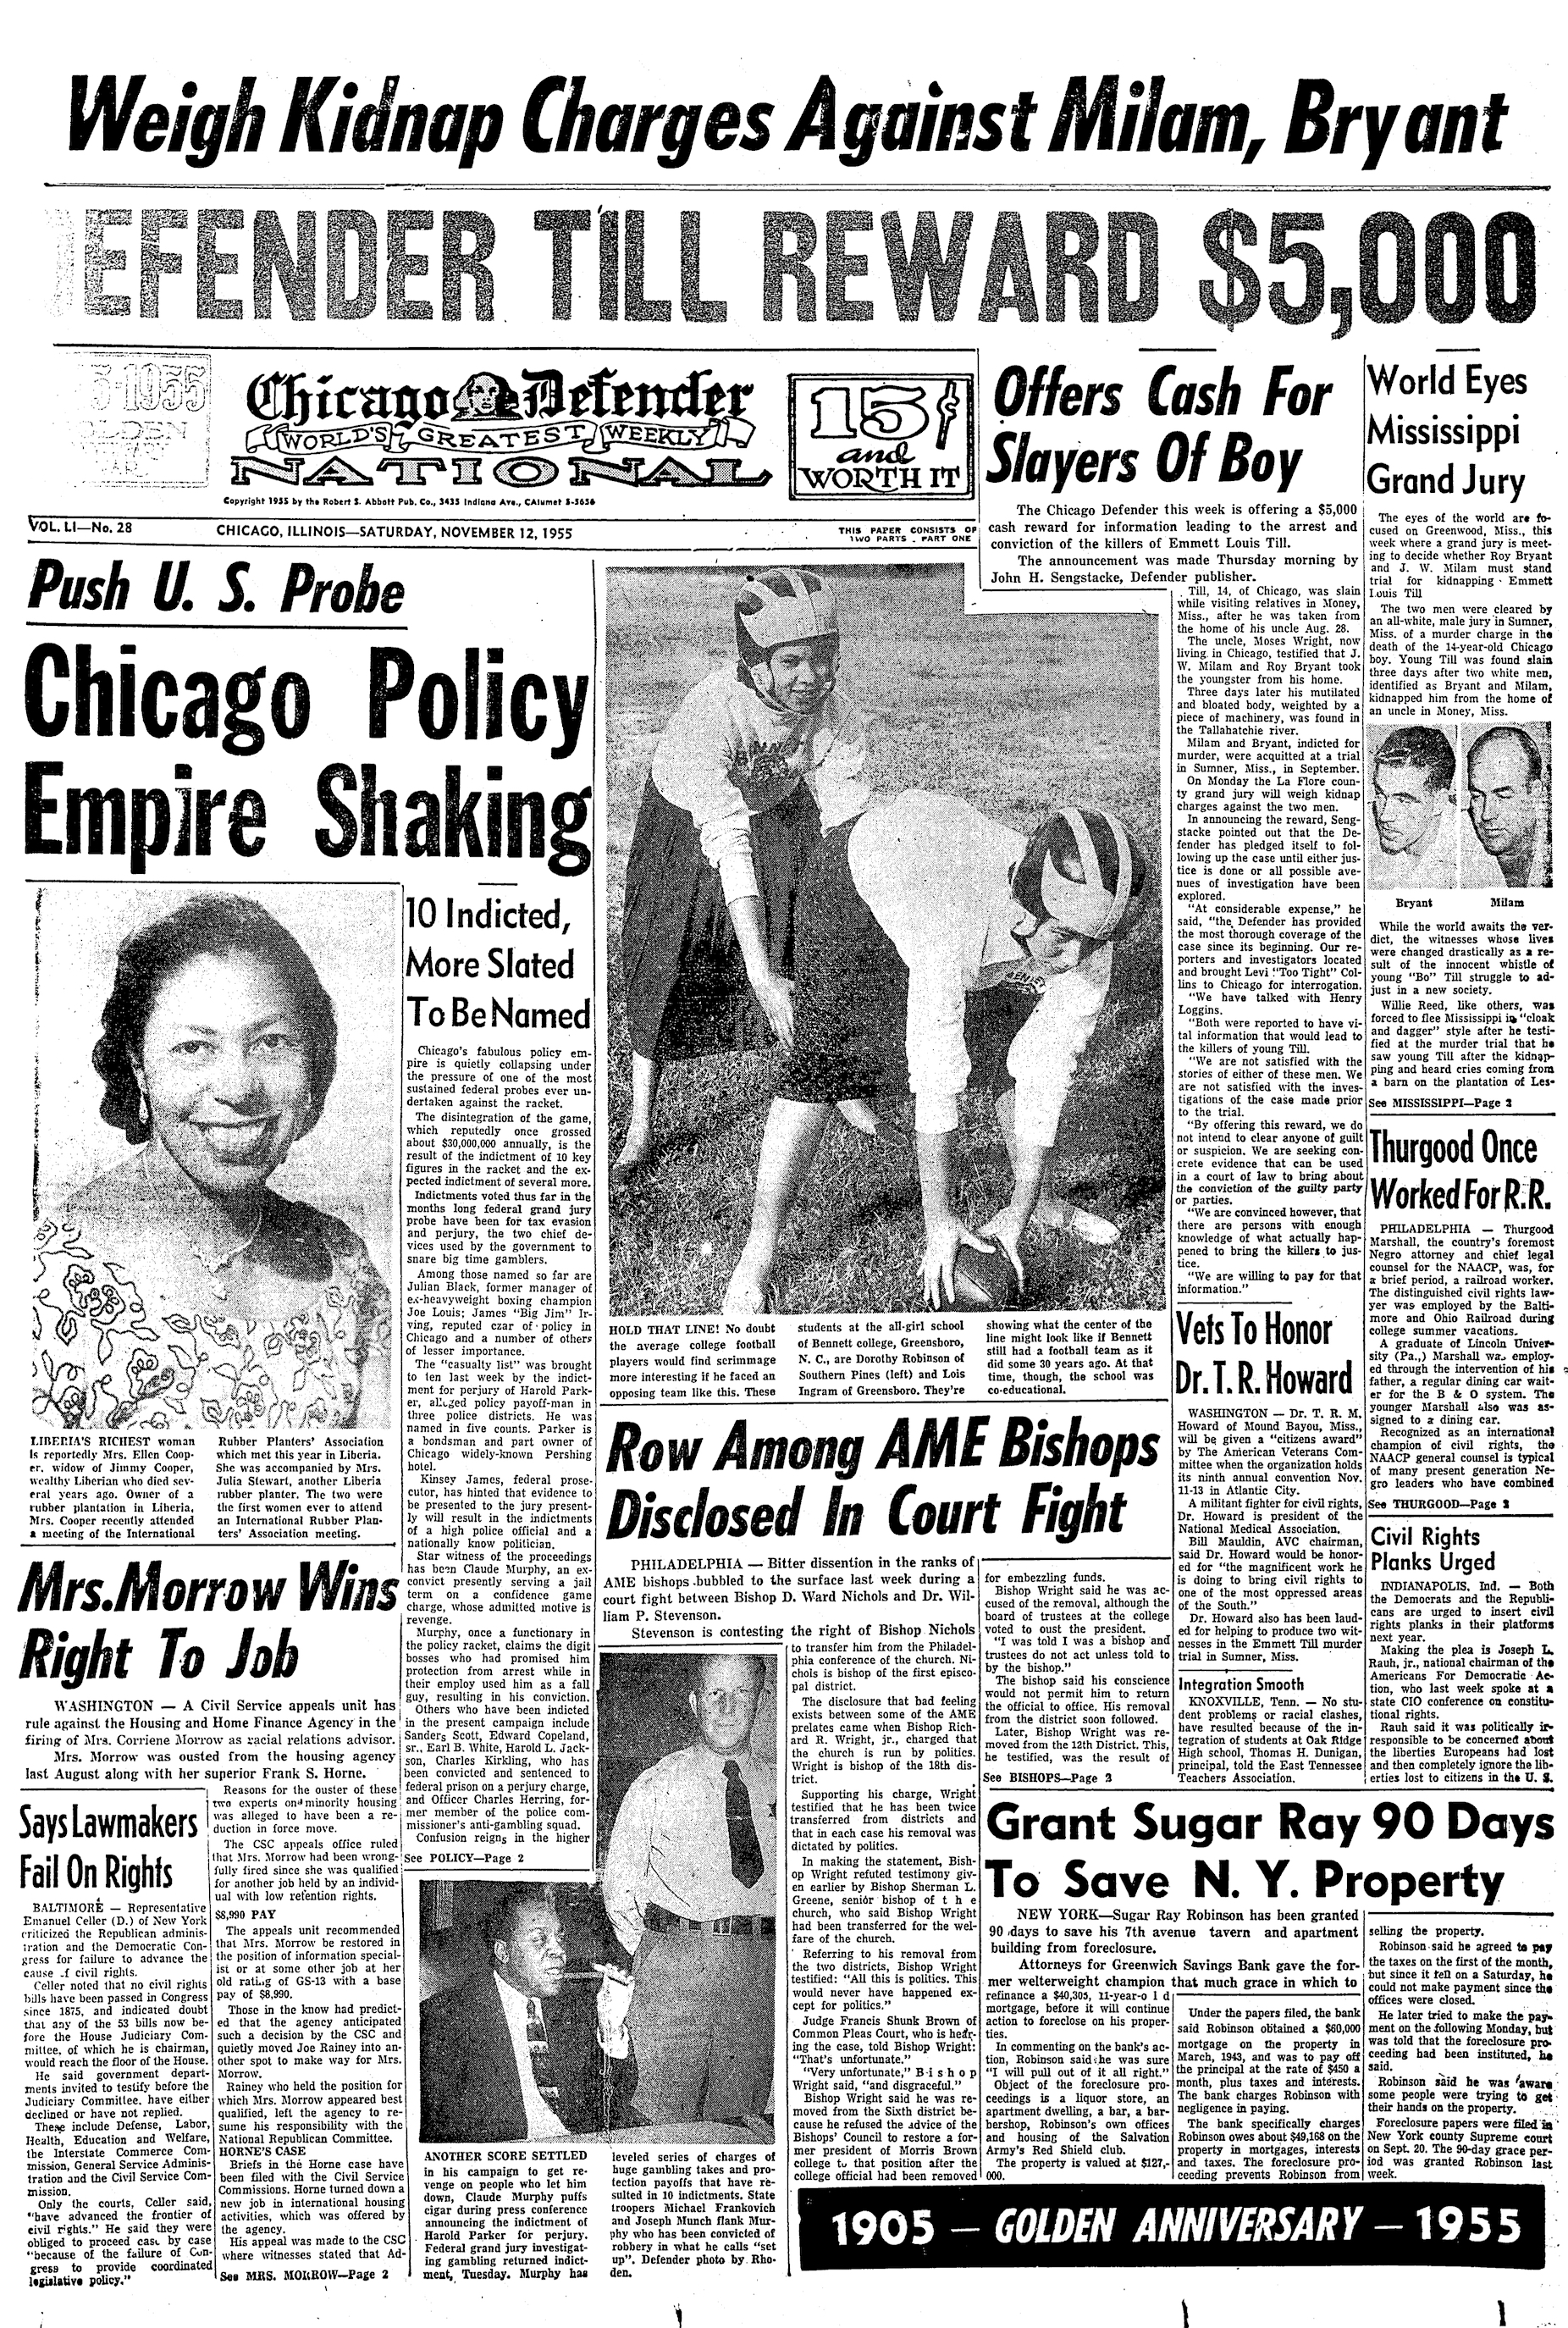 11.12.1955